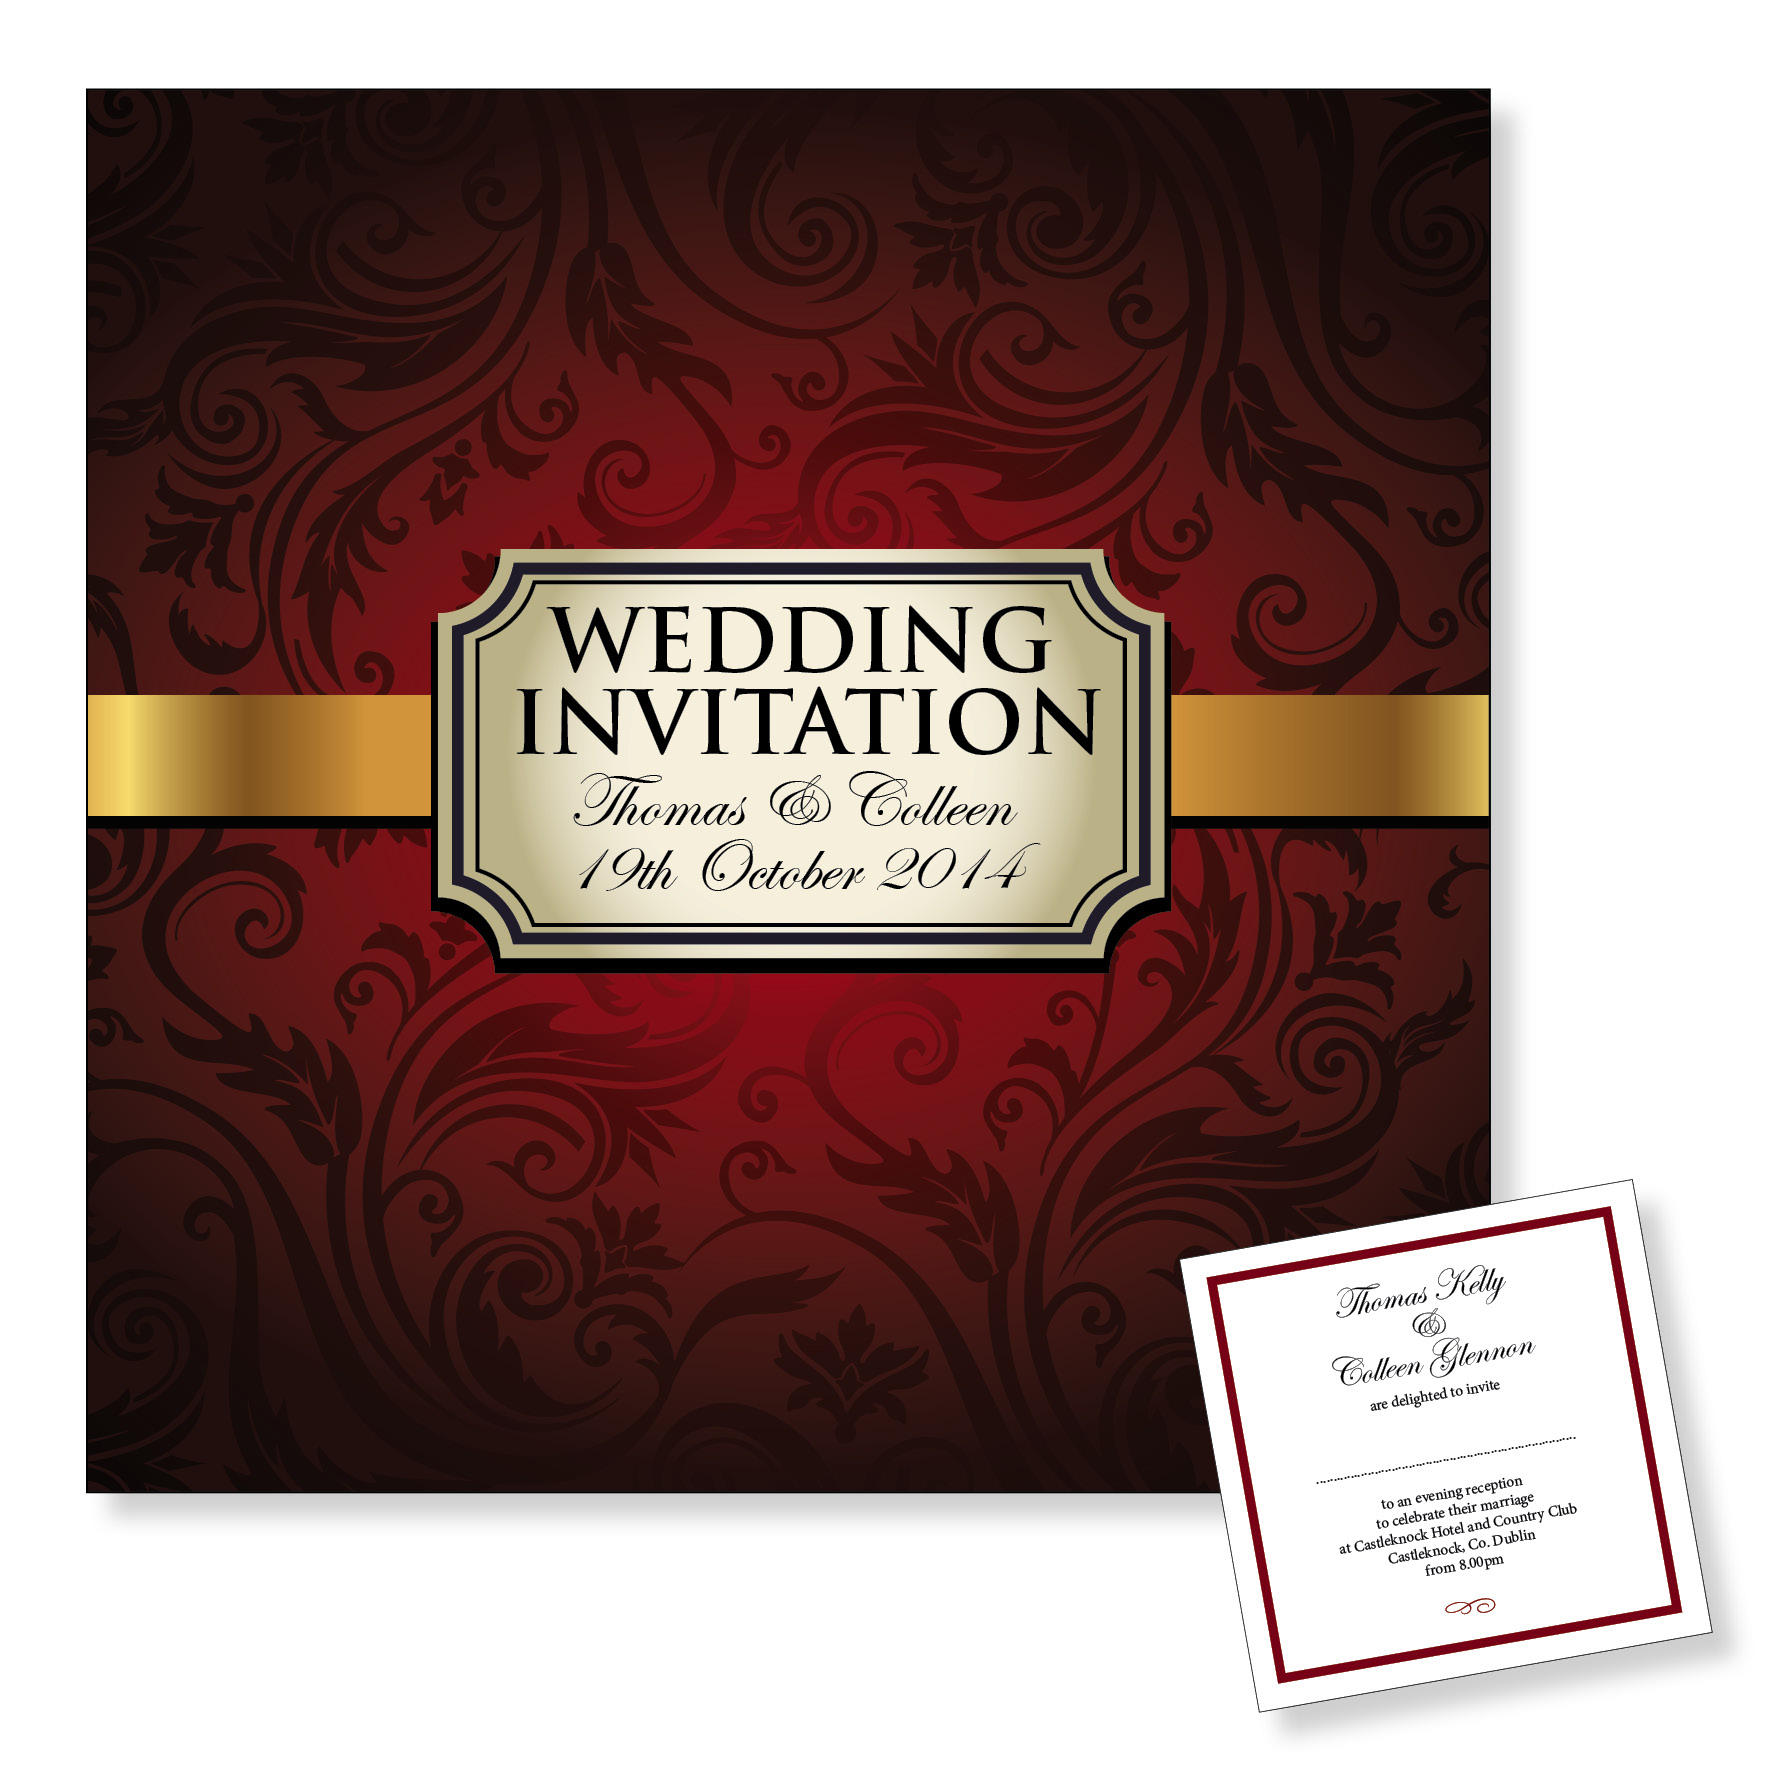 Vintage style wedding evening invitation